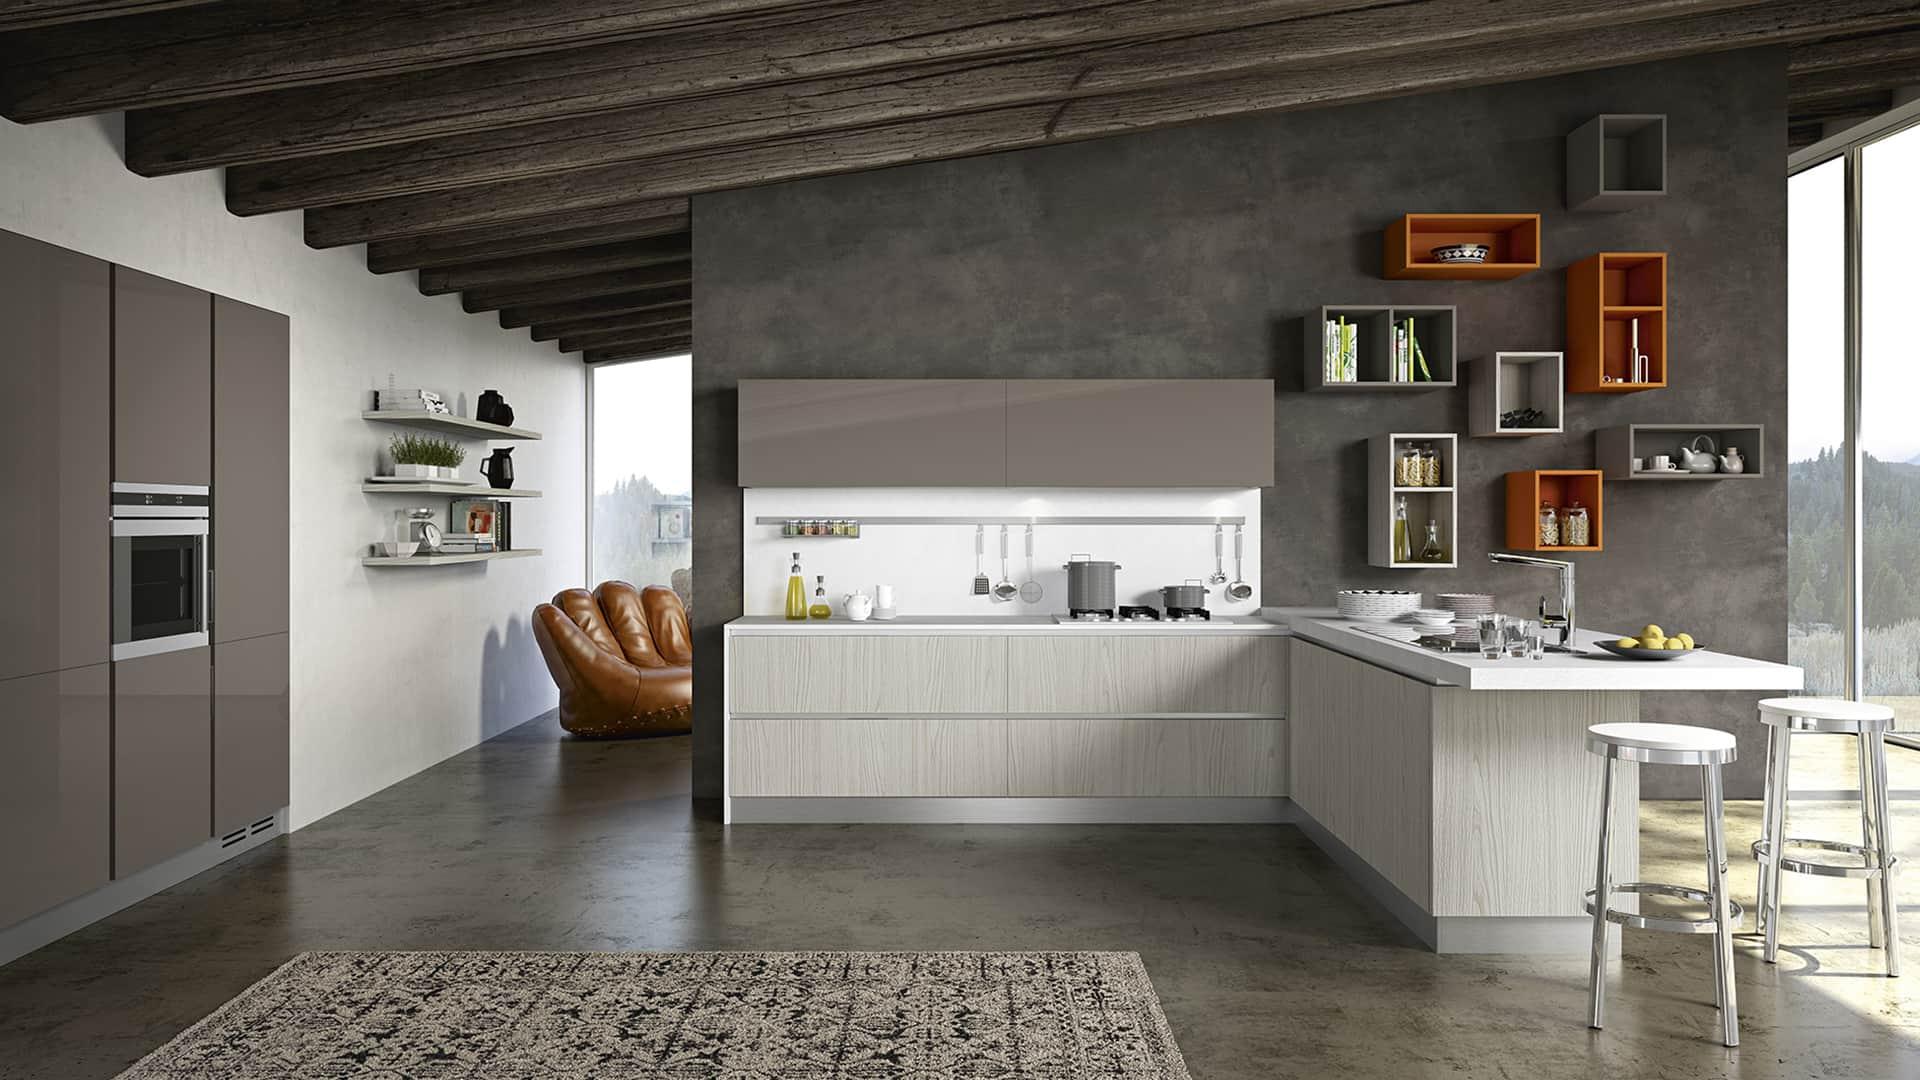 Cucine moderne con penisola padova - Cucine a penisola ...